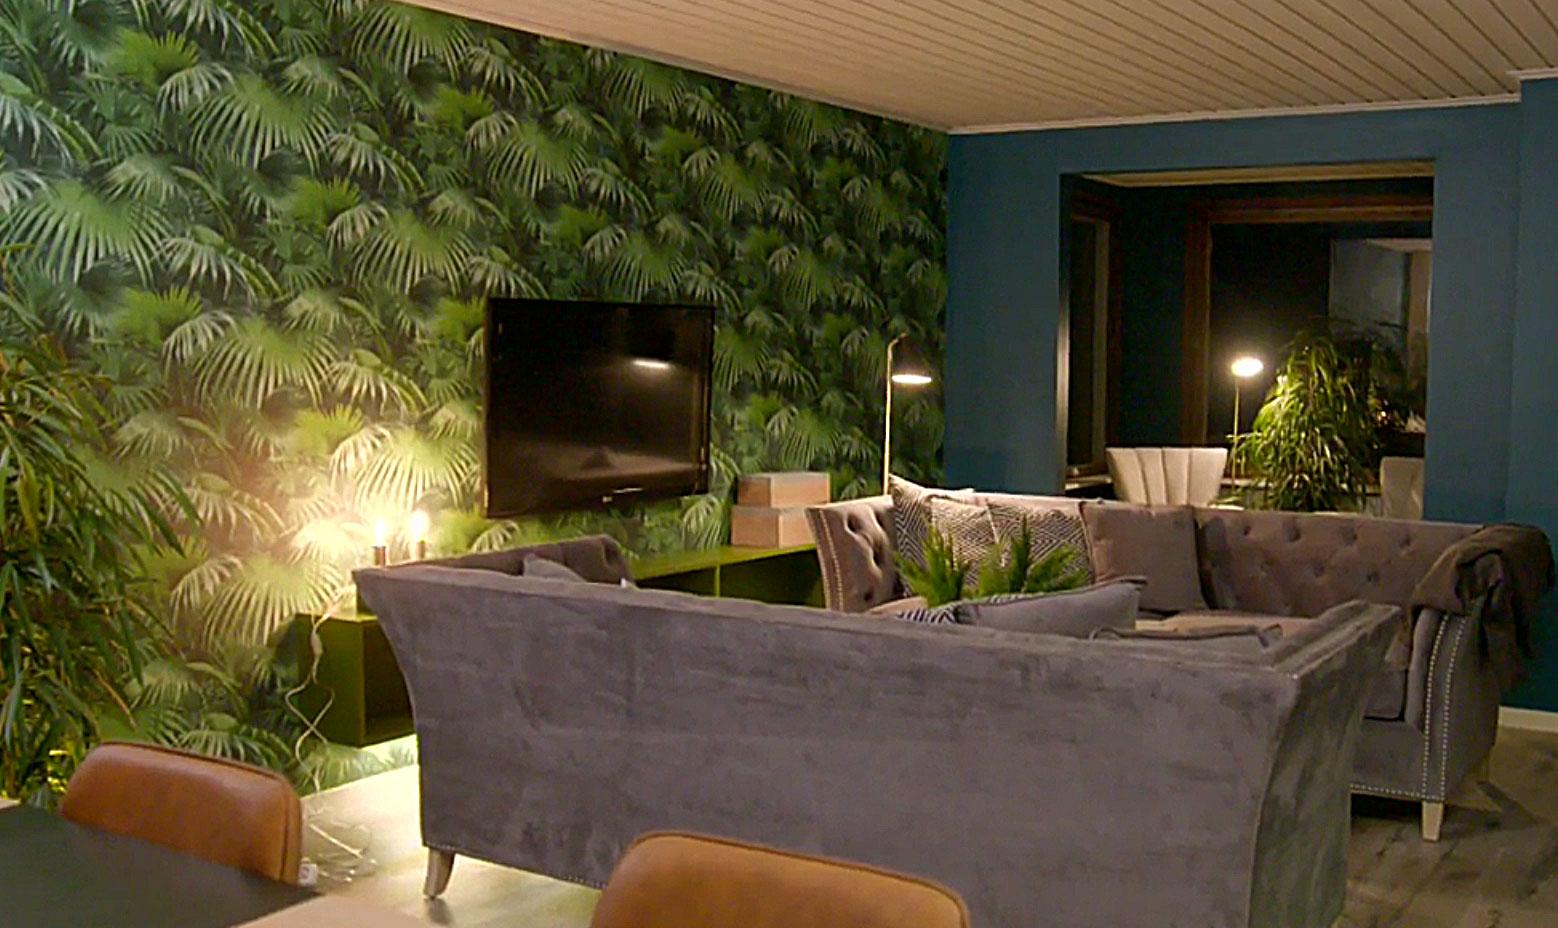 palmsöndagen-palmblad-vardagsrum-tapeter-midbec-1